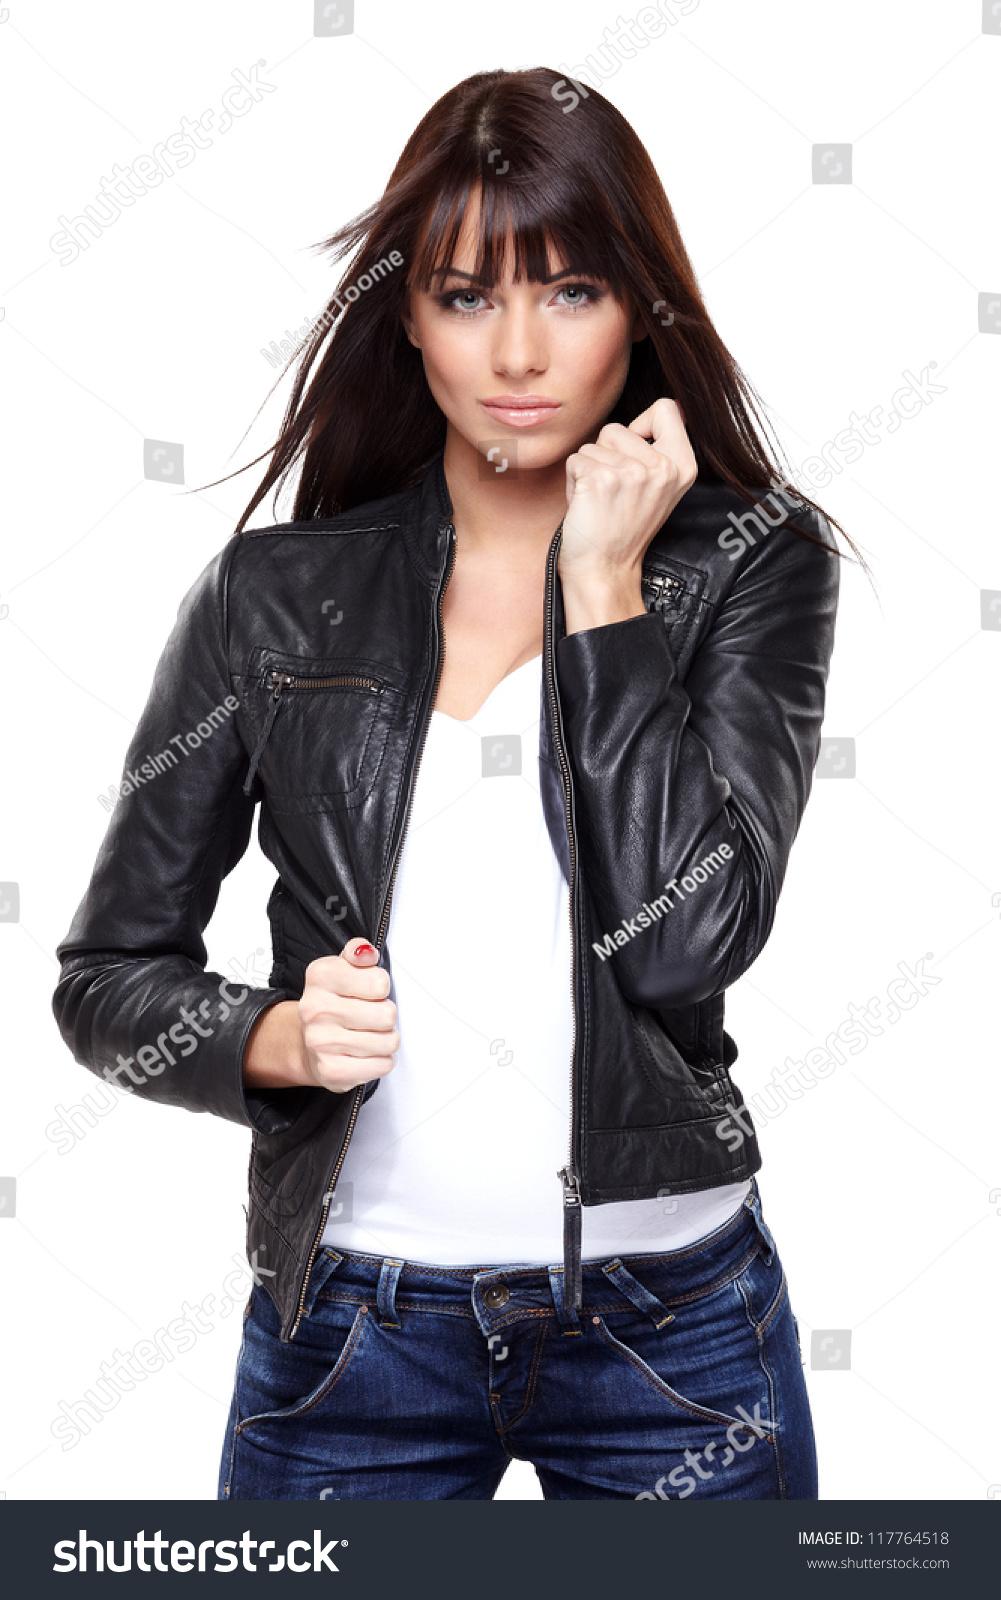 Glamorous Young Woman Black Leather Jacket Stock Photo 117764518